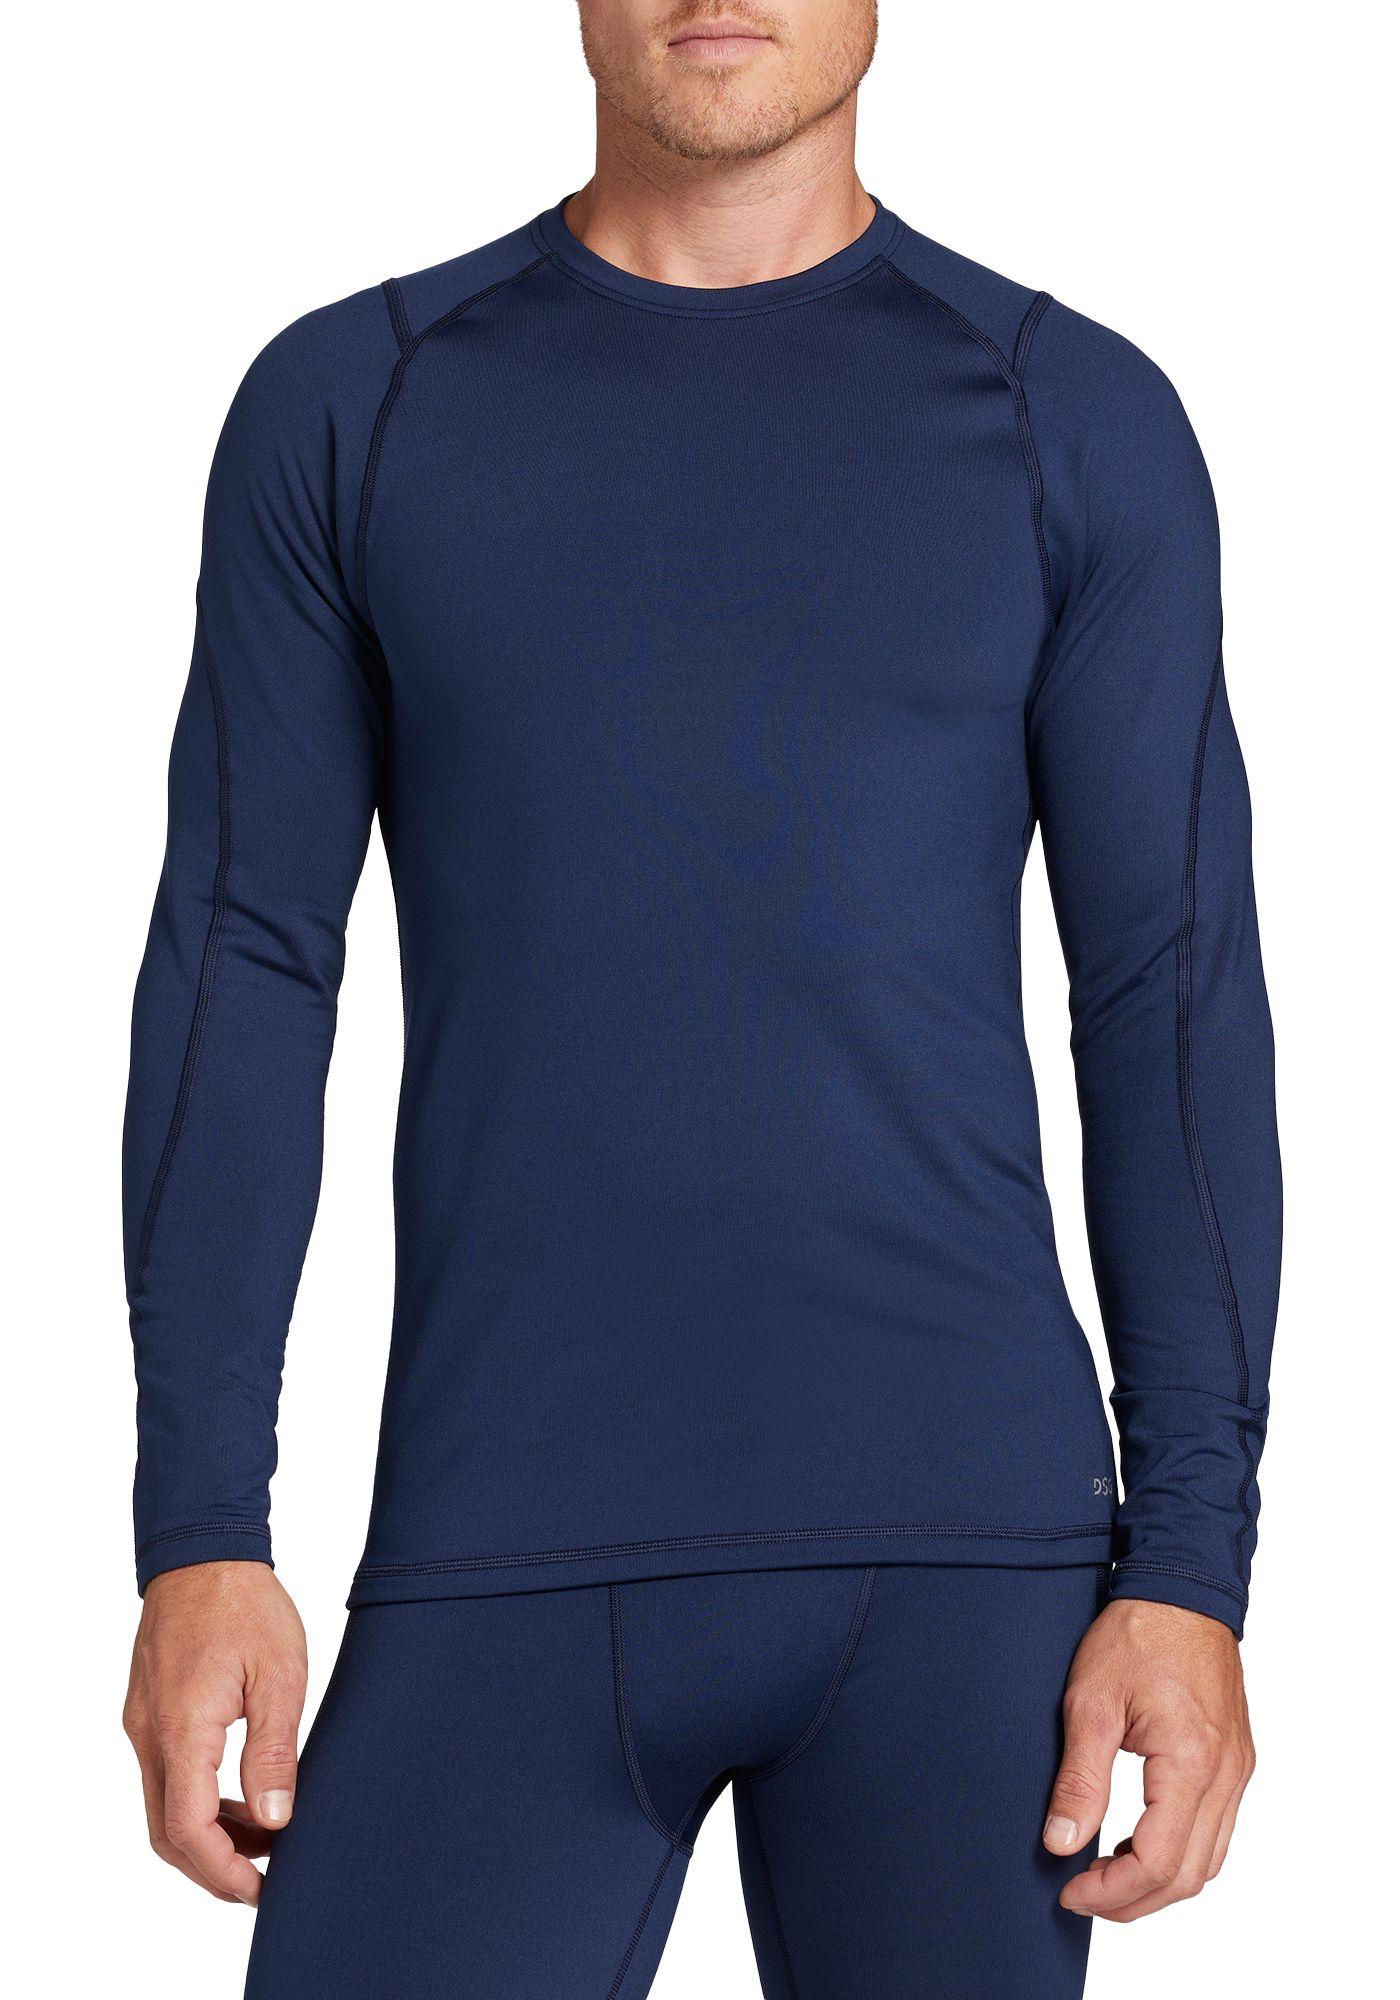 DSG Men's Cold Weather Compression Crewneck Long Sleeve Shirt